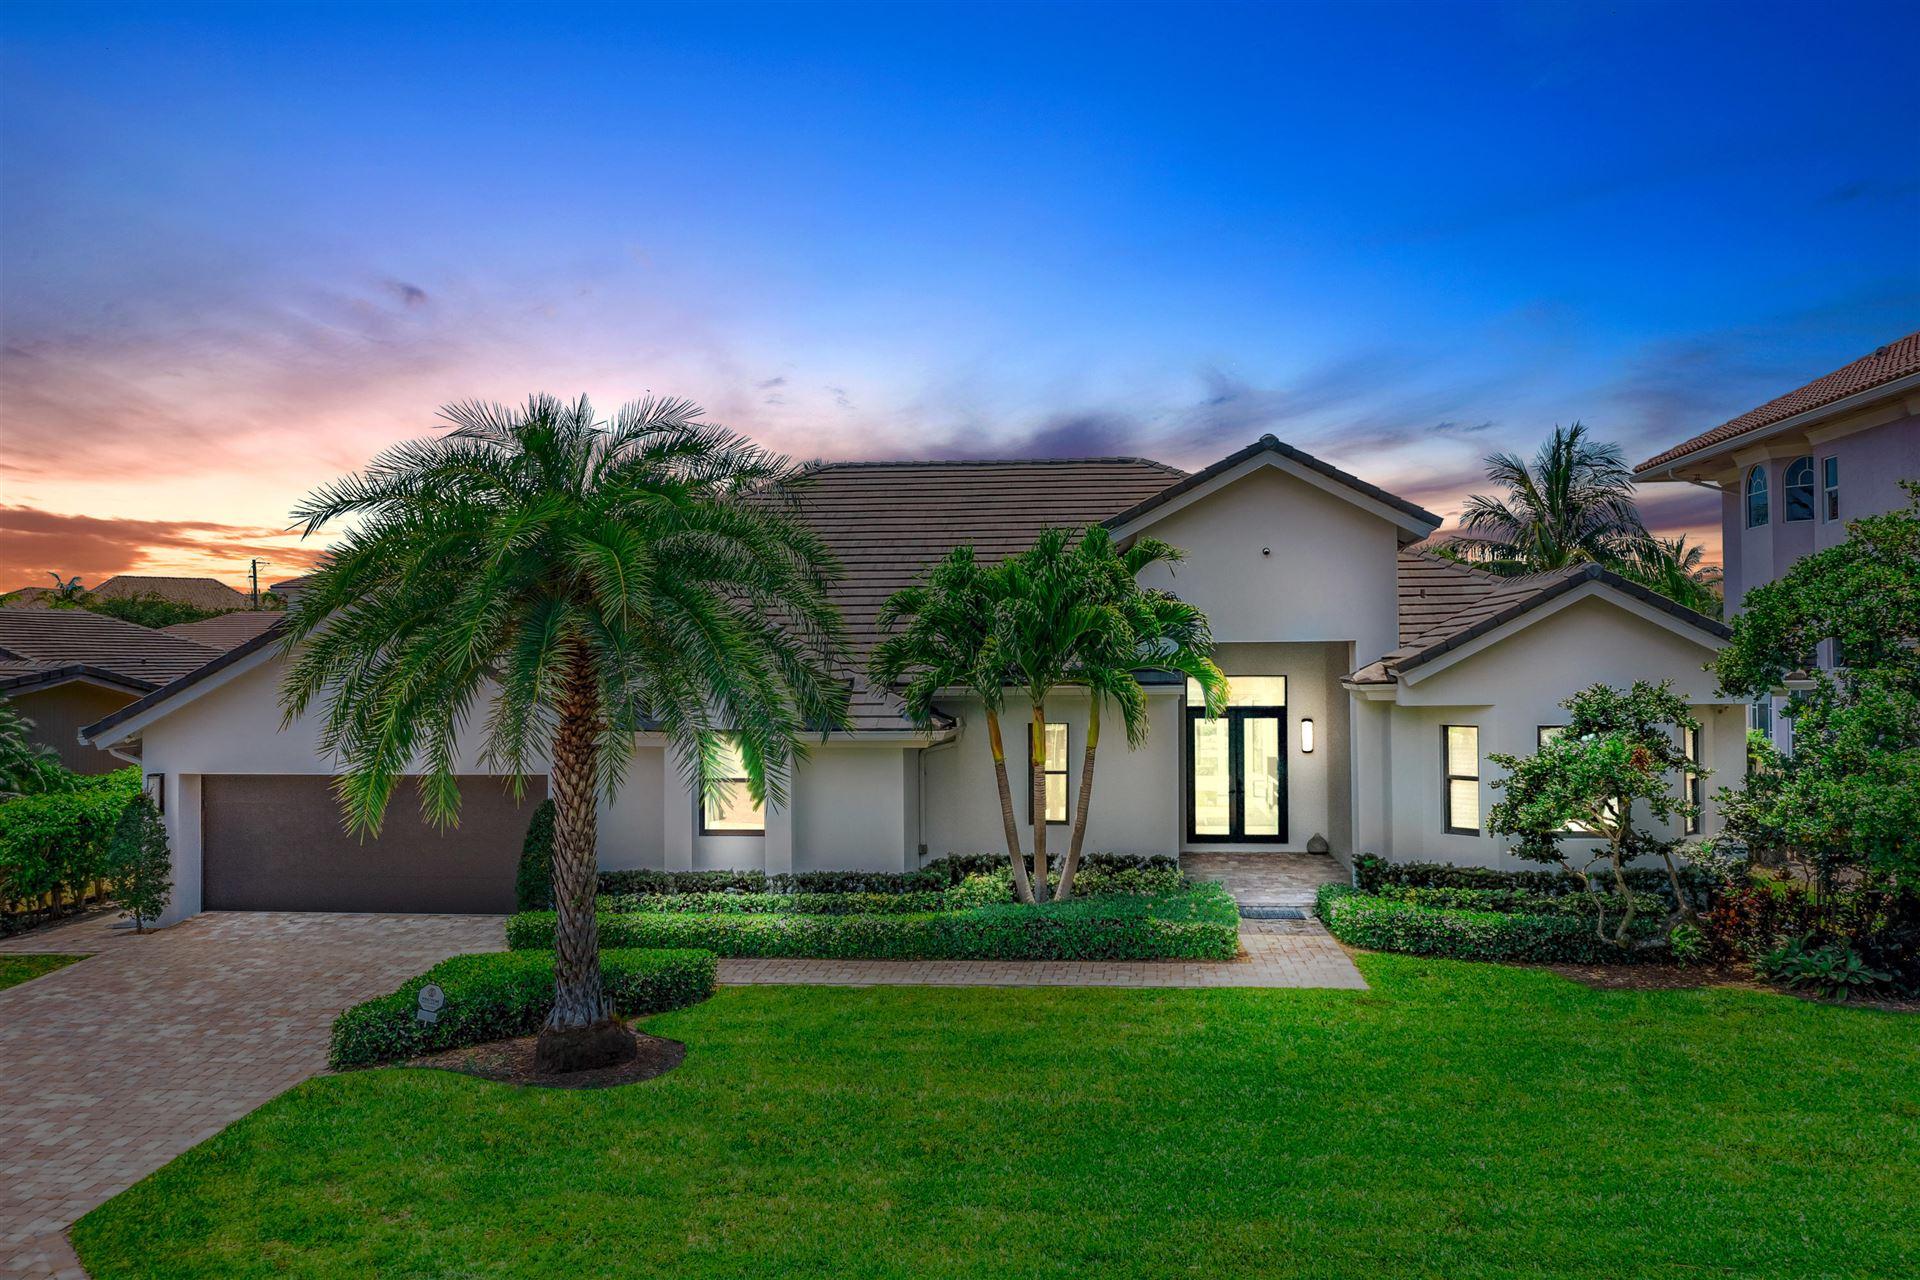 968 Cypress Drive, Delray Beach, FL 33483 - #: RX-10715351